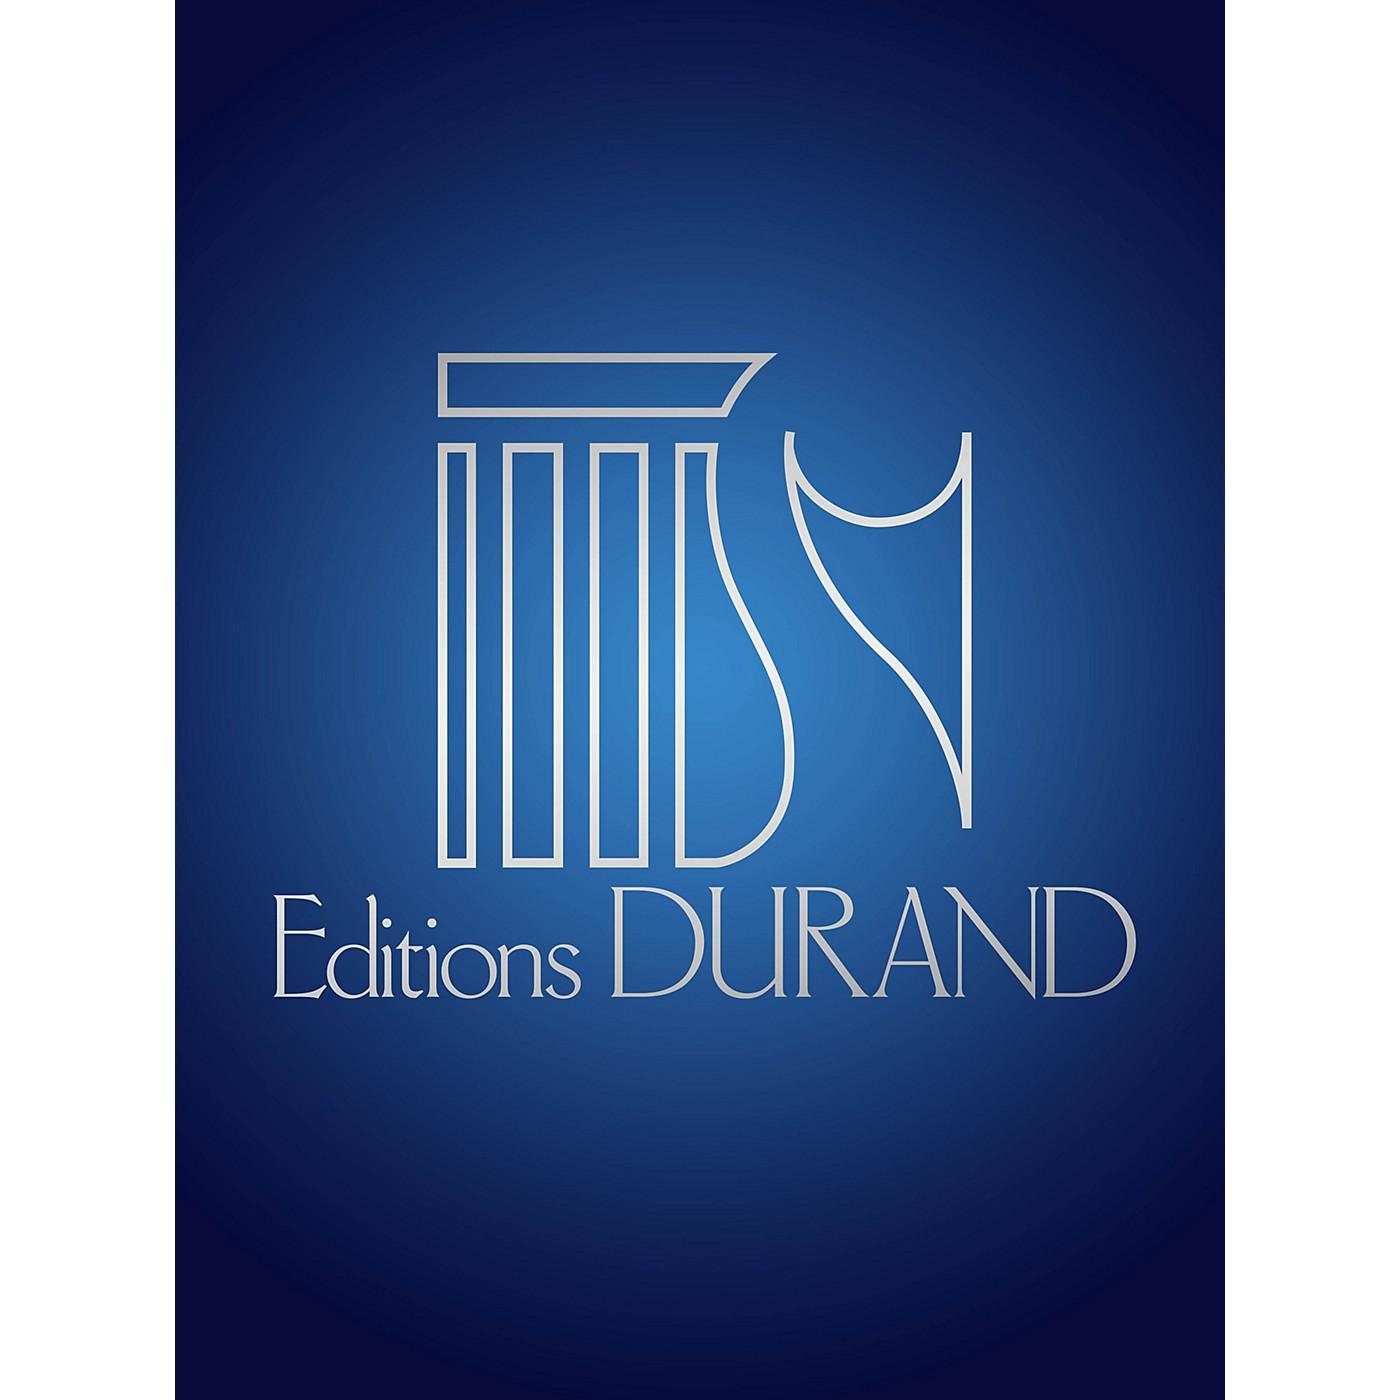 Hal Leonard Children At Play Harp Solo Editions Durand Series thumbnail